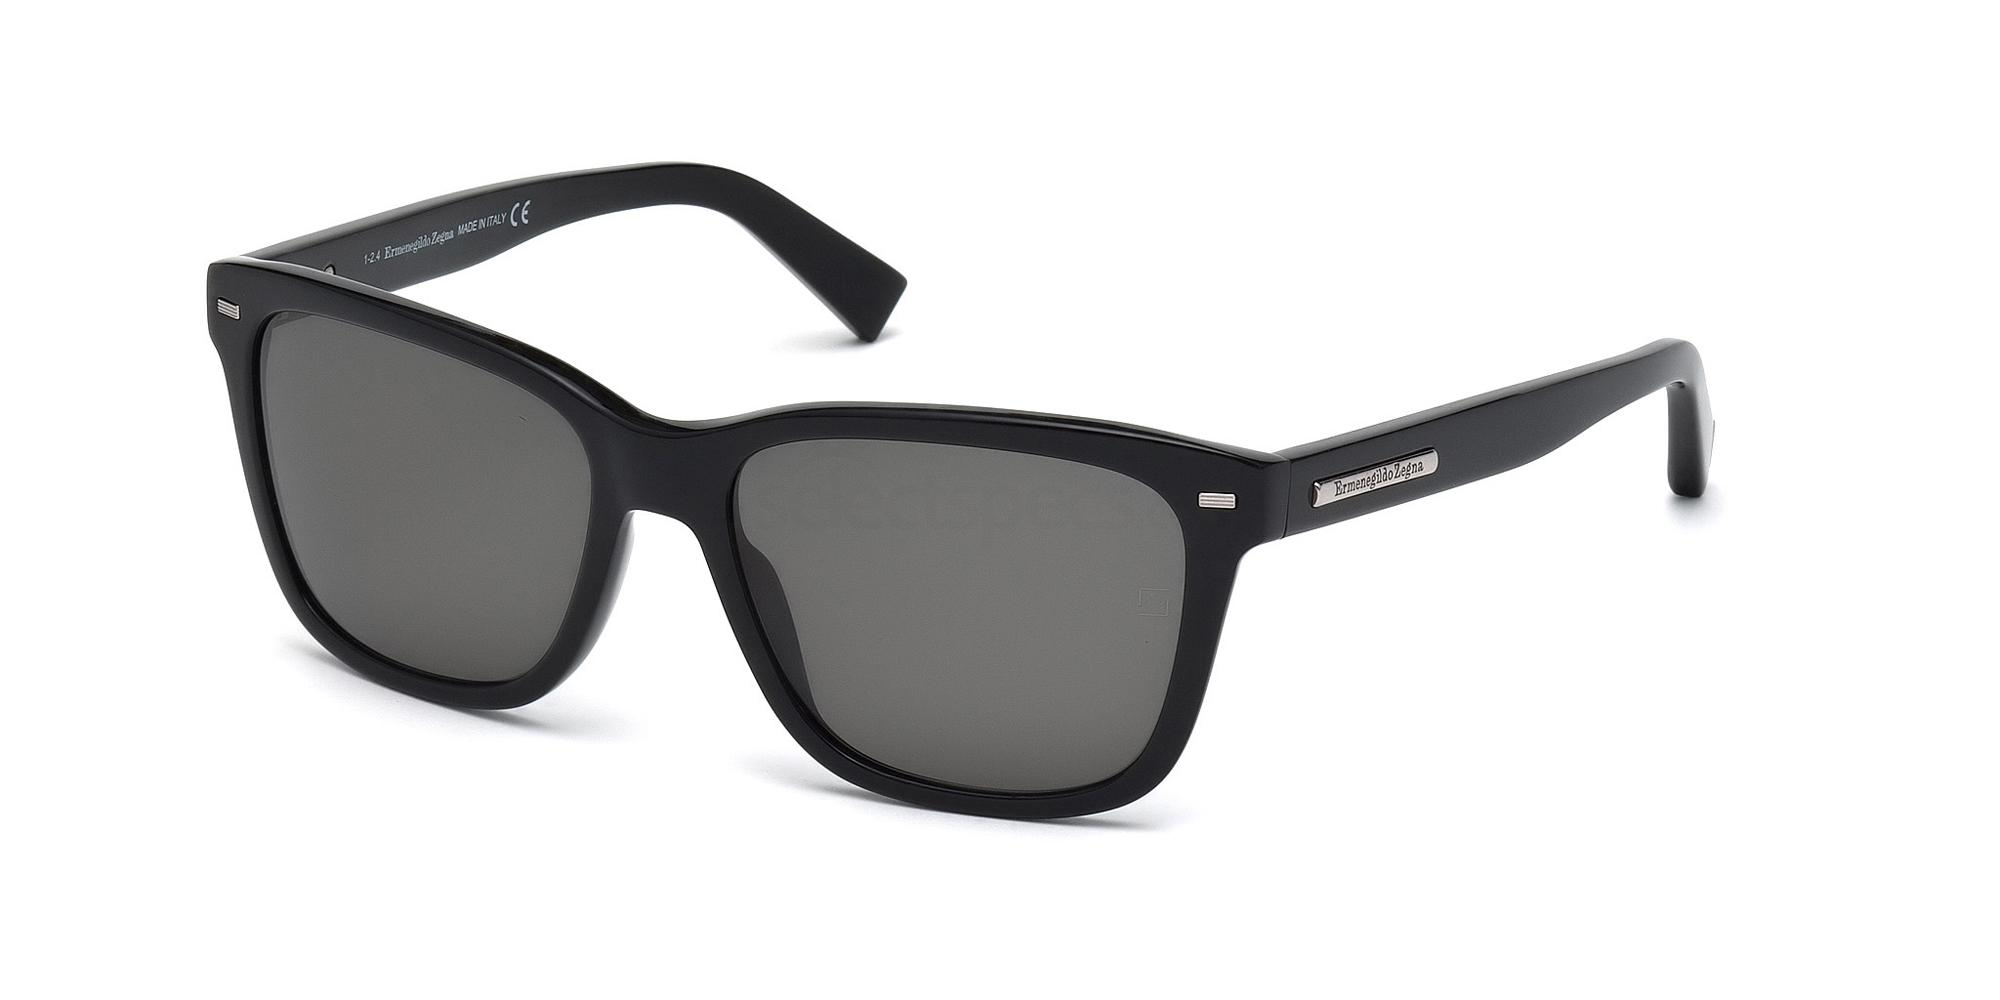 01D EZ0002 Sunglasses, Ermenegildo Zegna